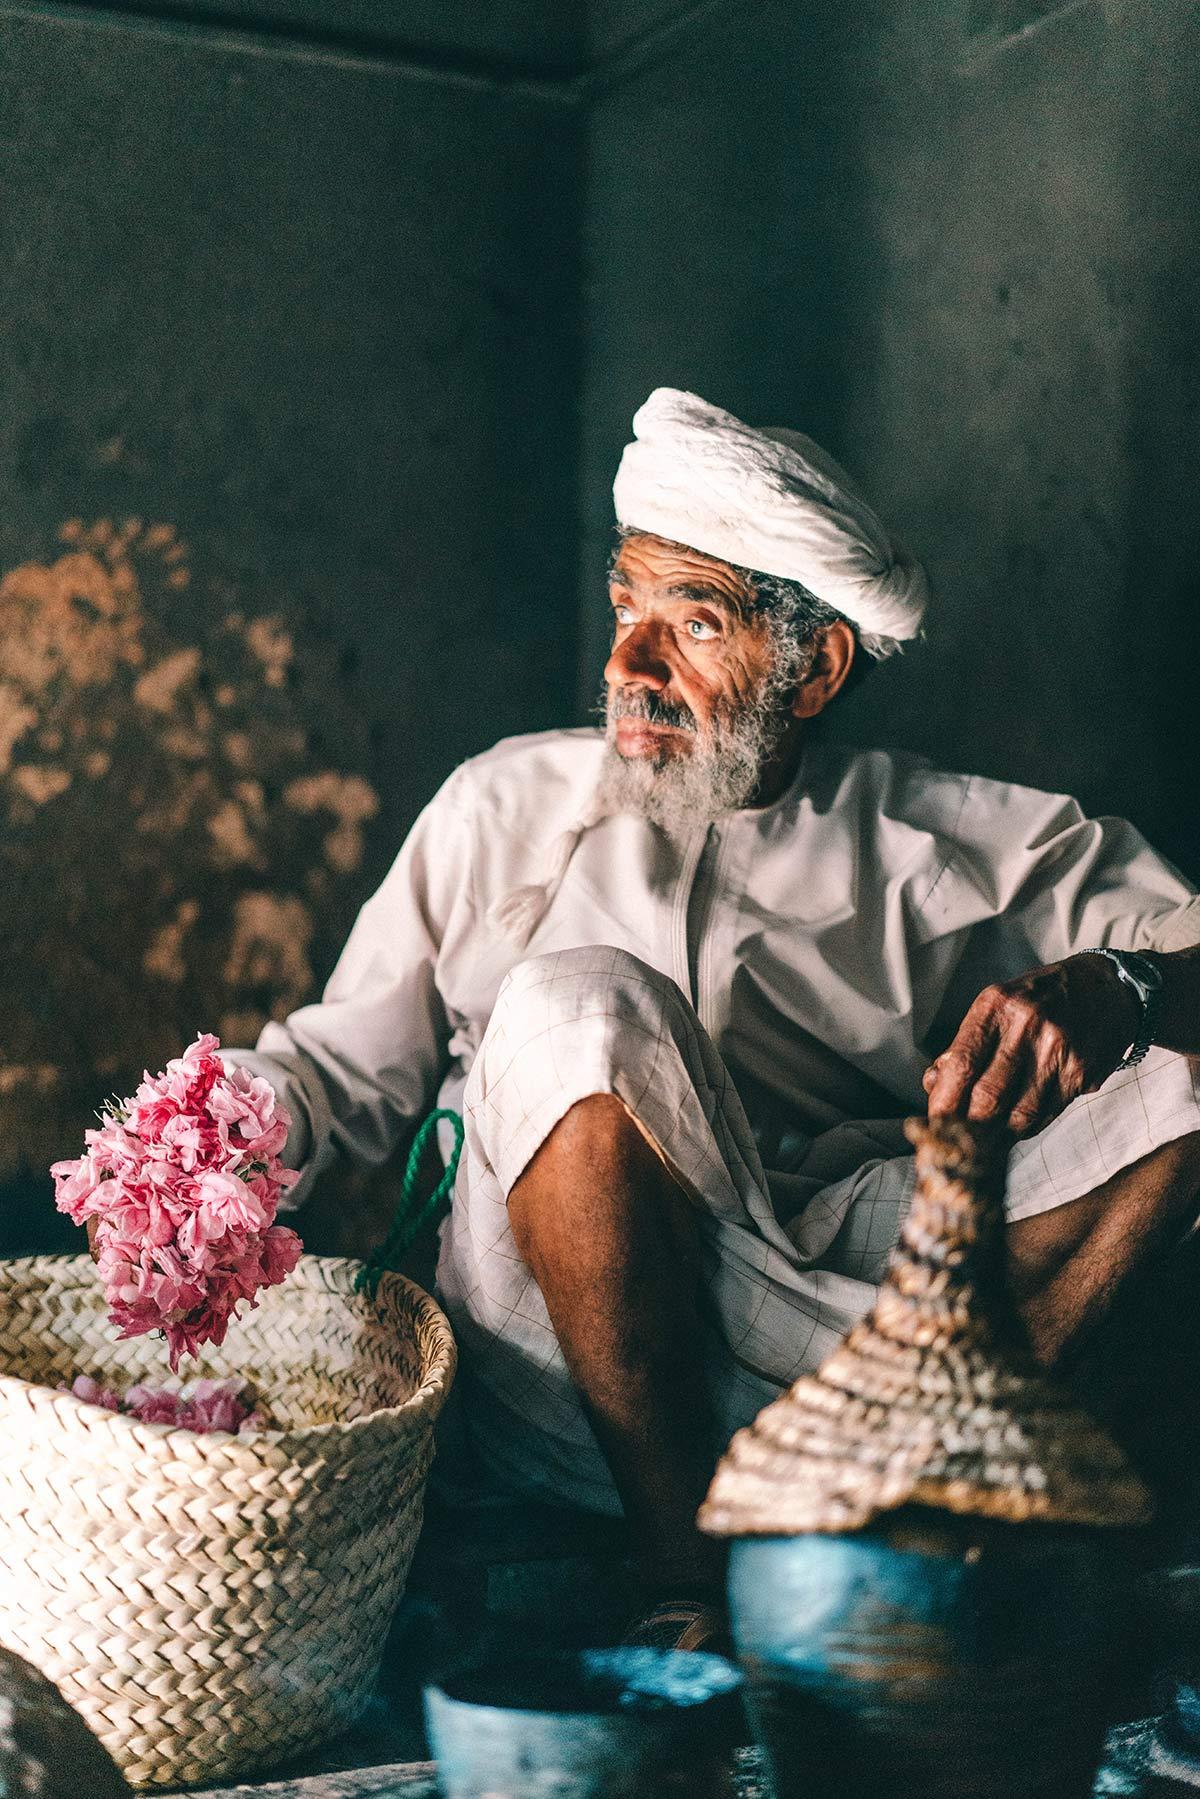 Oman Rosenwasser